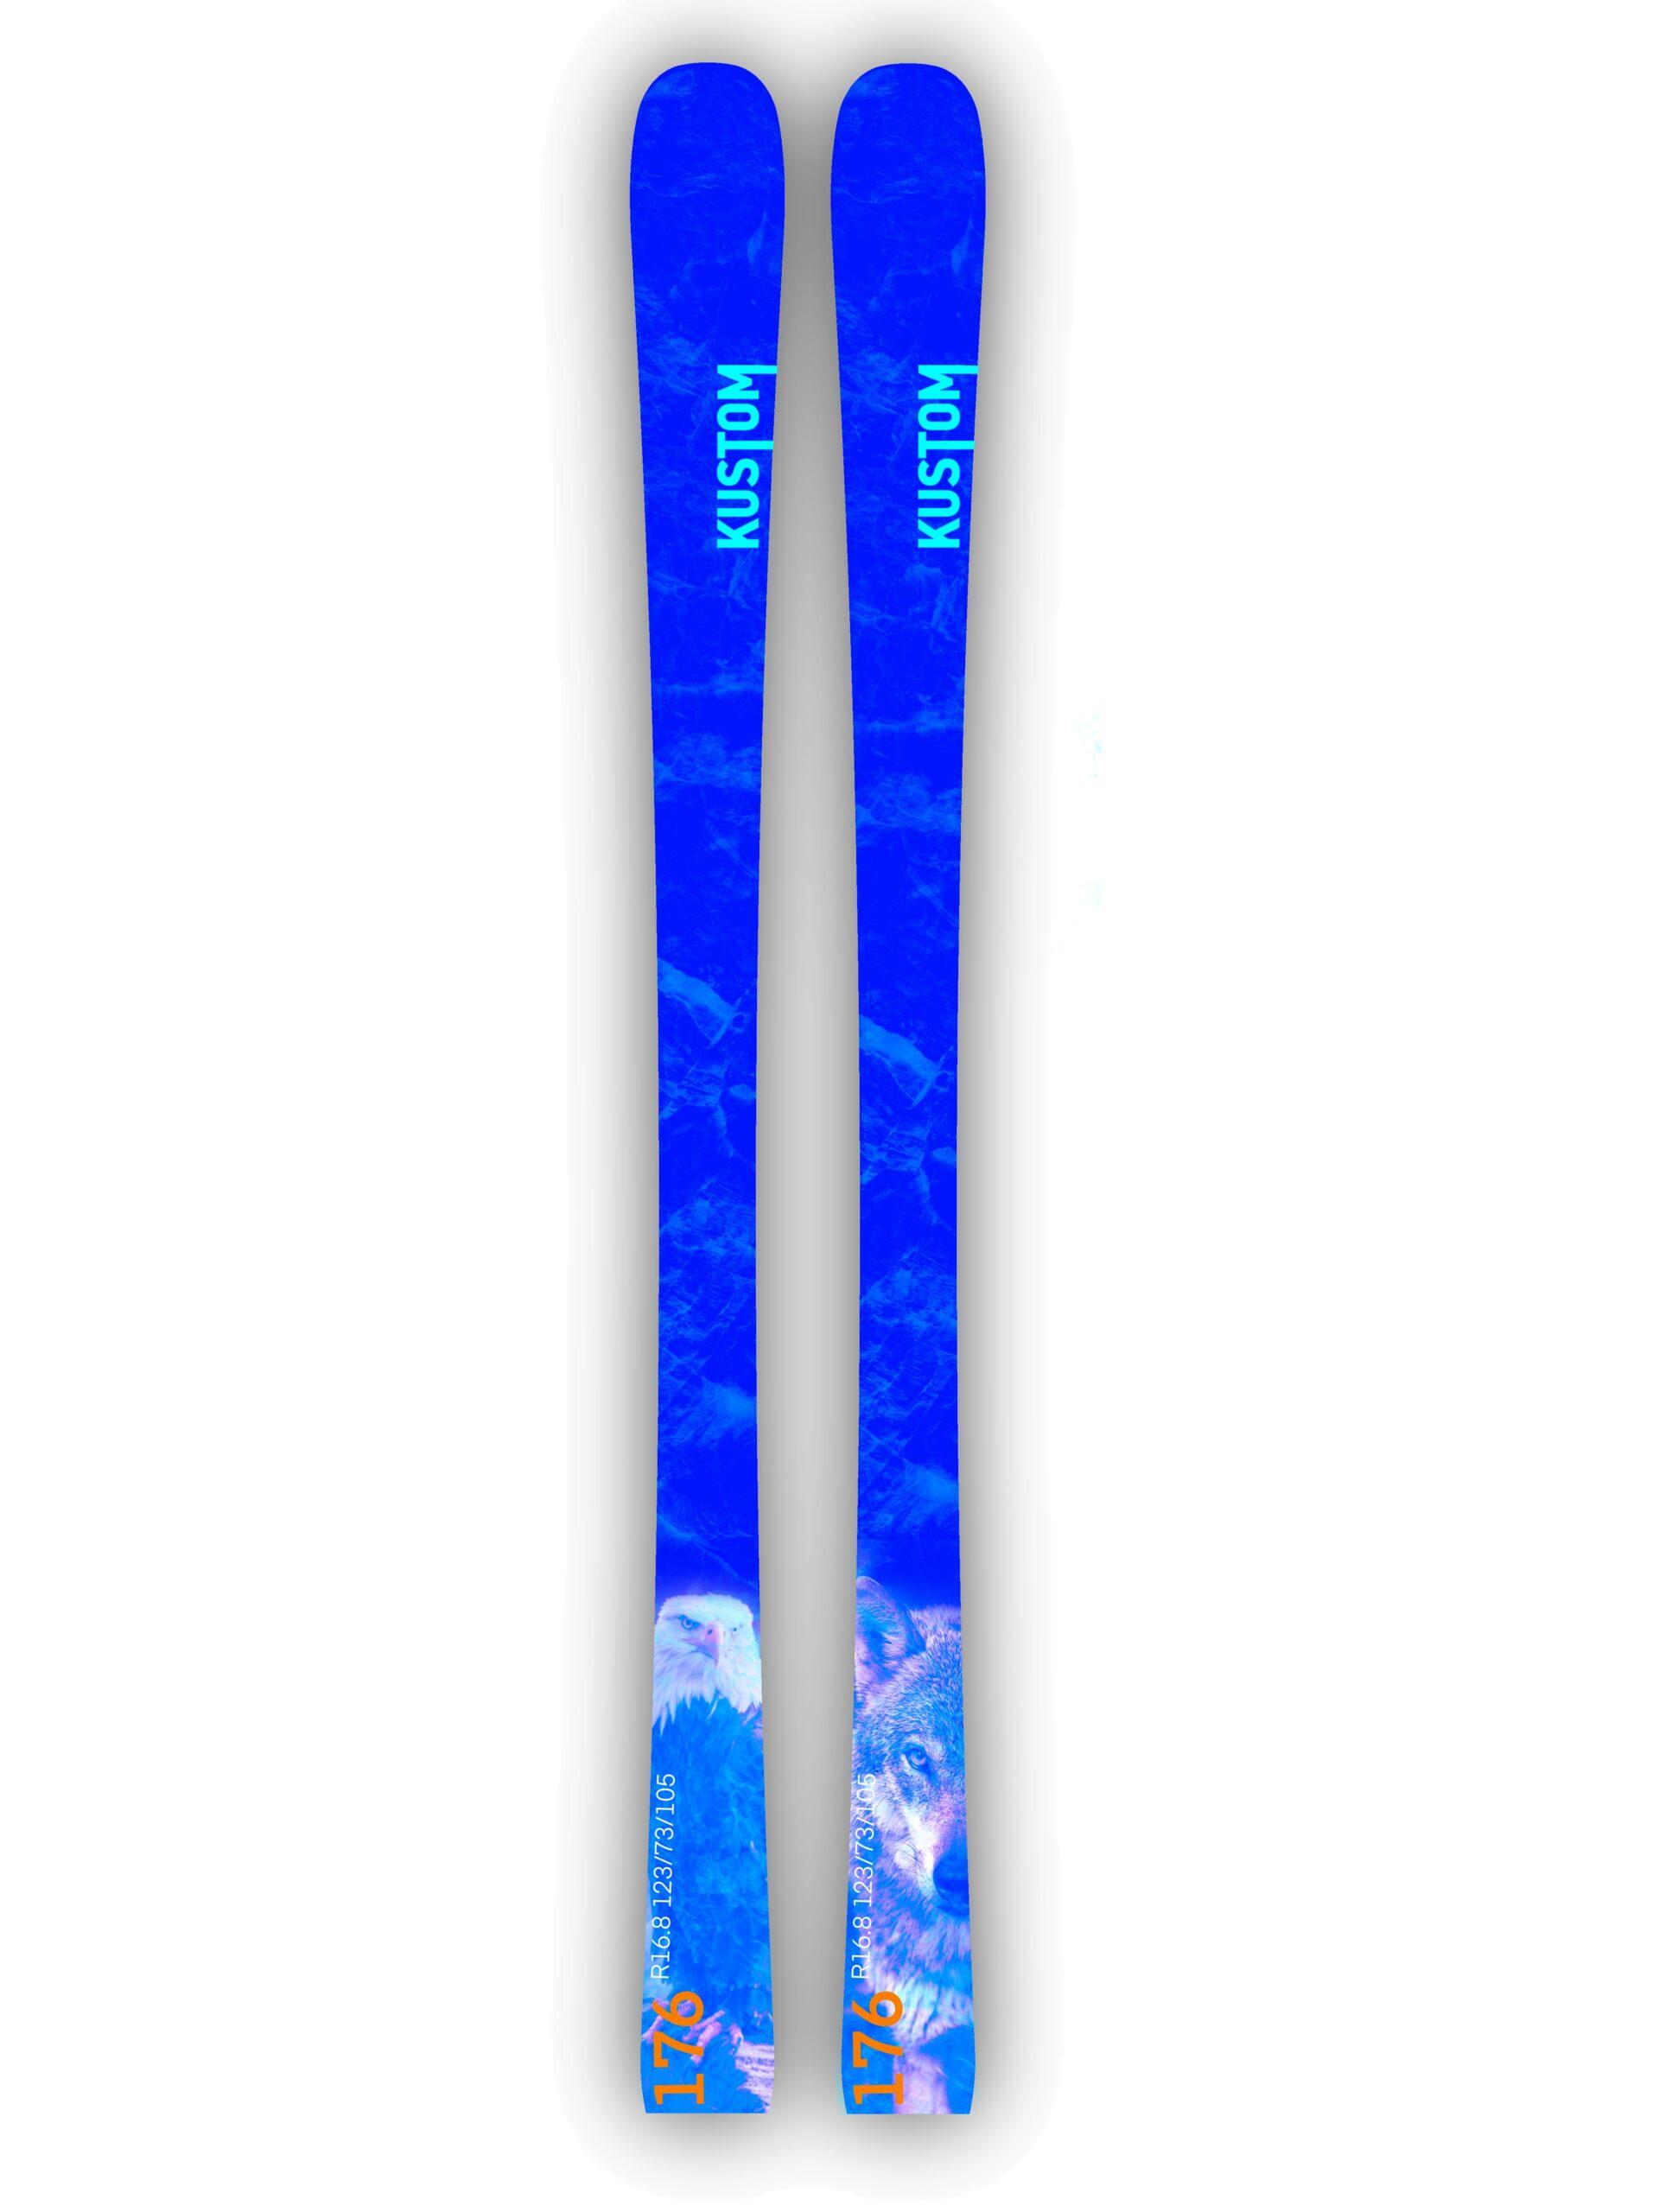 Kustom Skis esqui pista nueva colección Performance 02